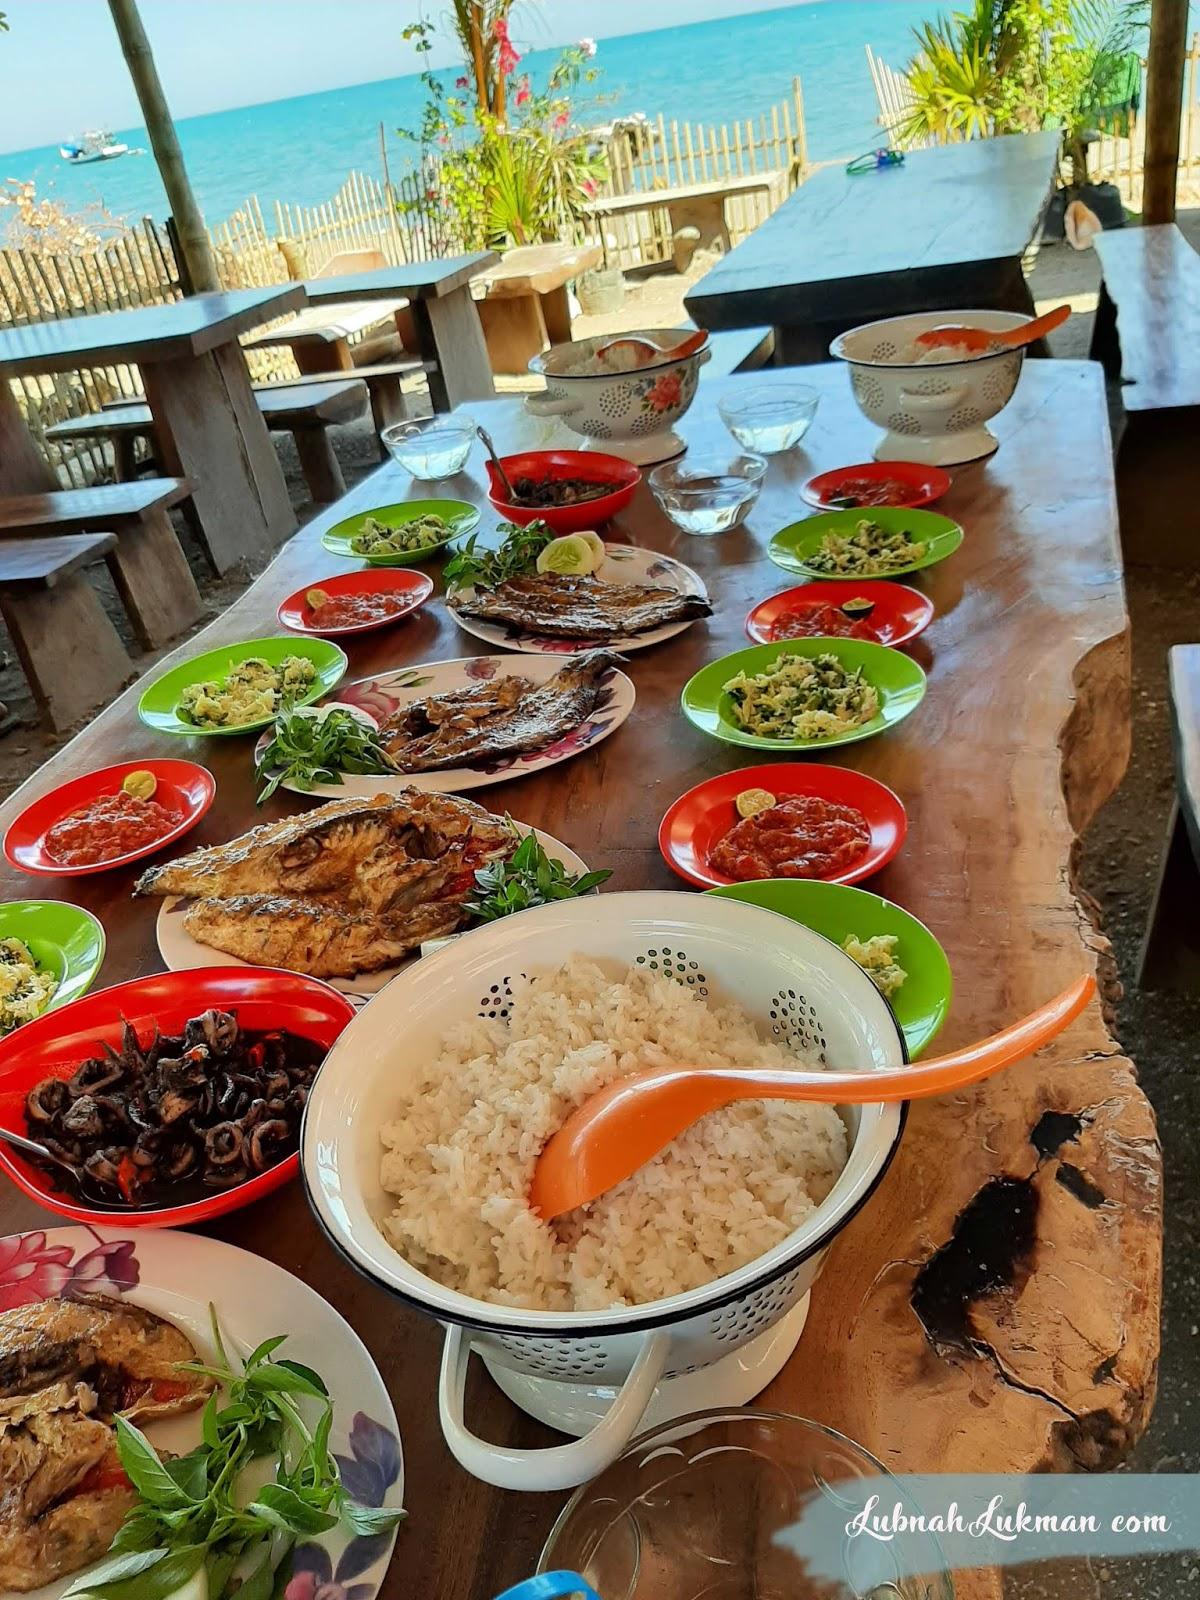 Kuliner Makassar, Kuliner Takalar